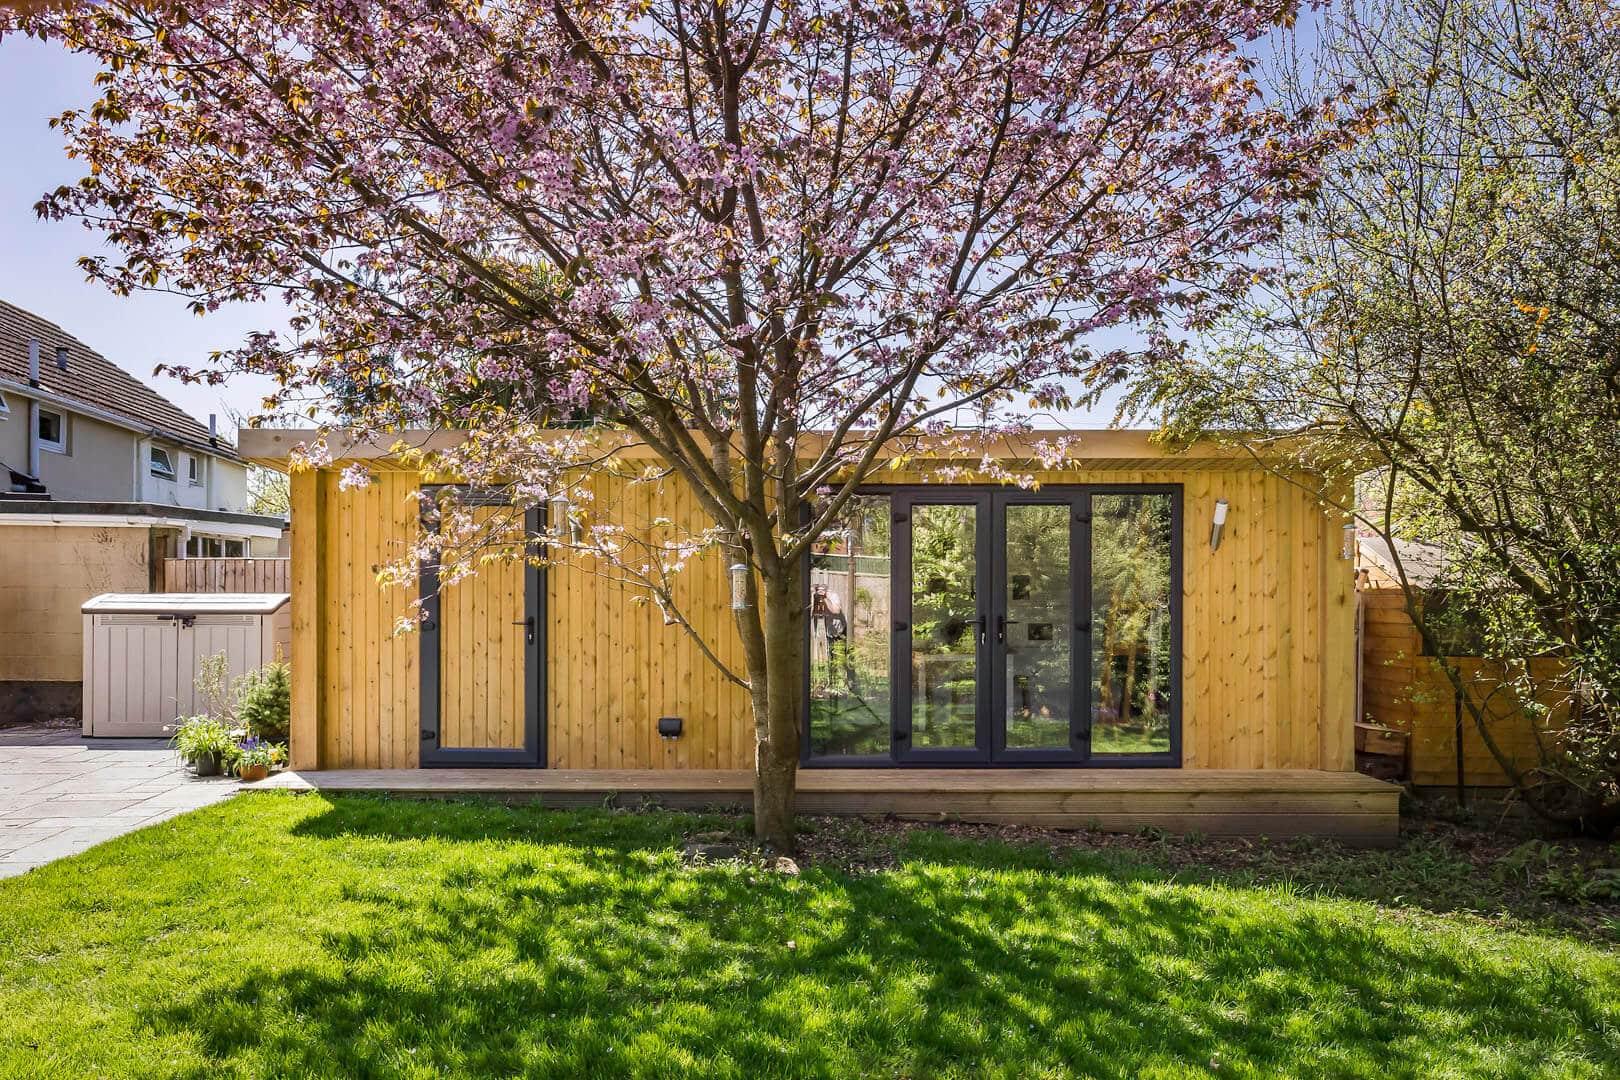 Home photography studio gallery x 3m green retreats for Garden room 7m x 5m